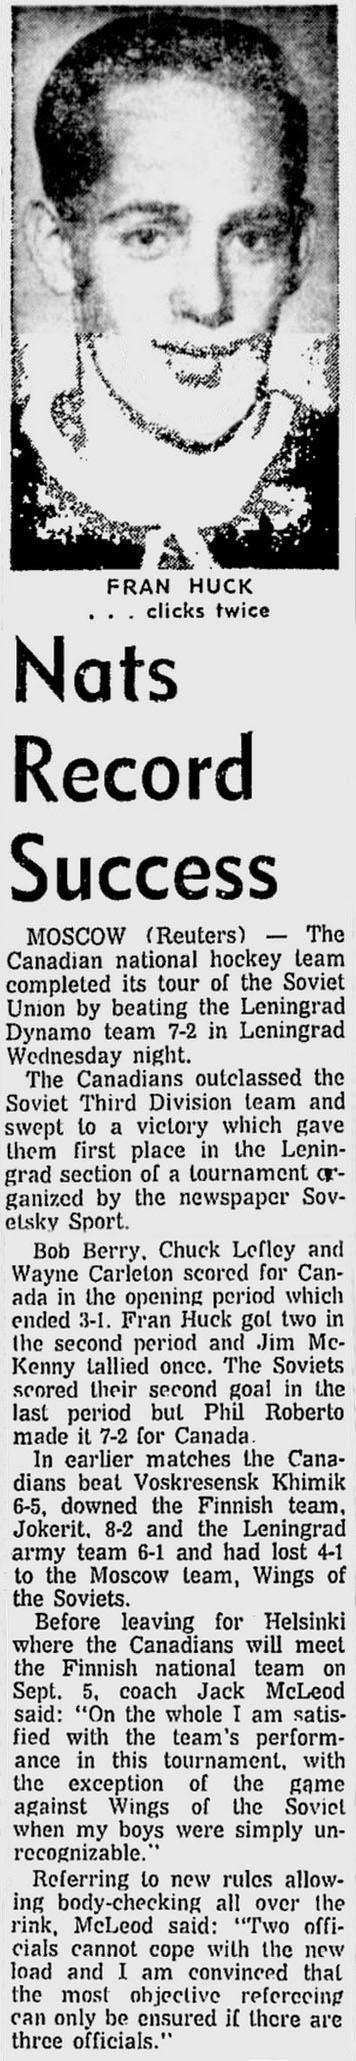 The Calgary Herald - Sep 4, 1969-15.jpg